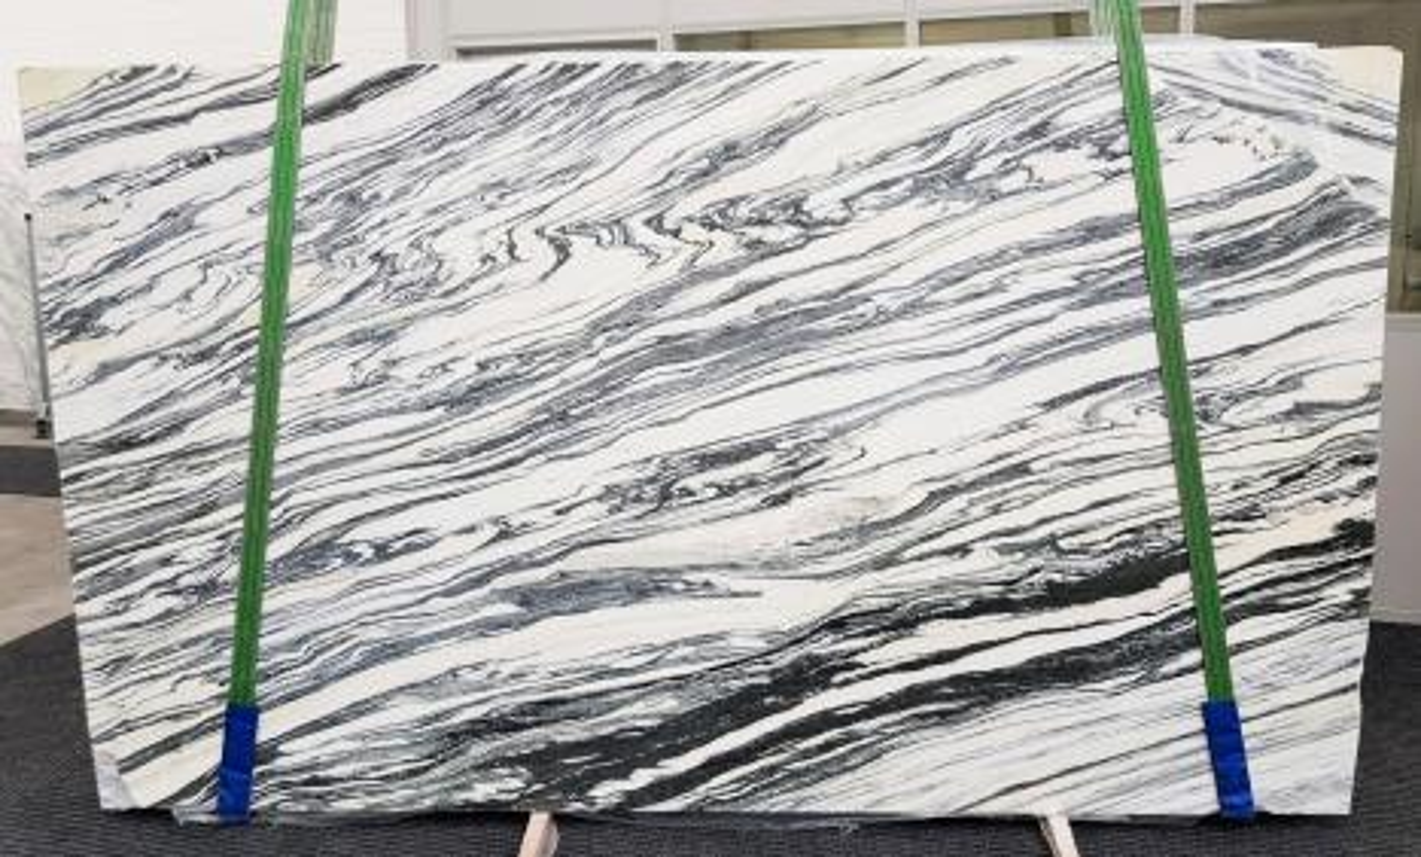 FANTASTICO ARNI VENATO Supply Veneto (Italy) polished slabs 1058 , Slab #10 natural marble